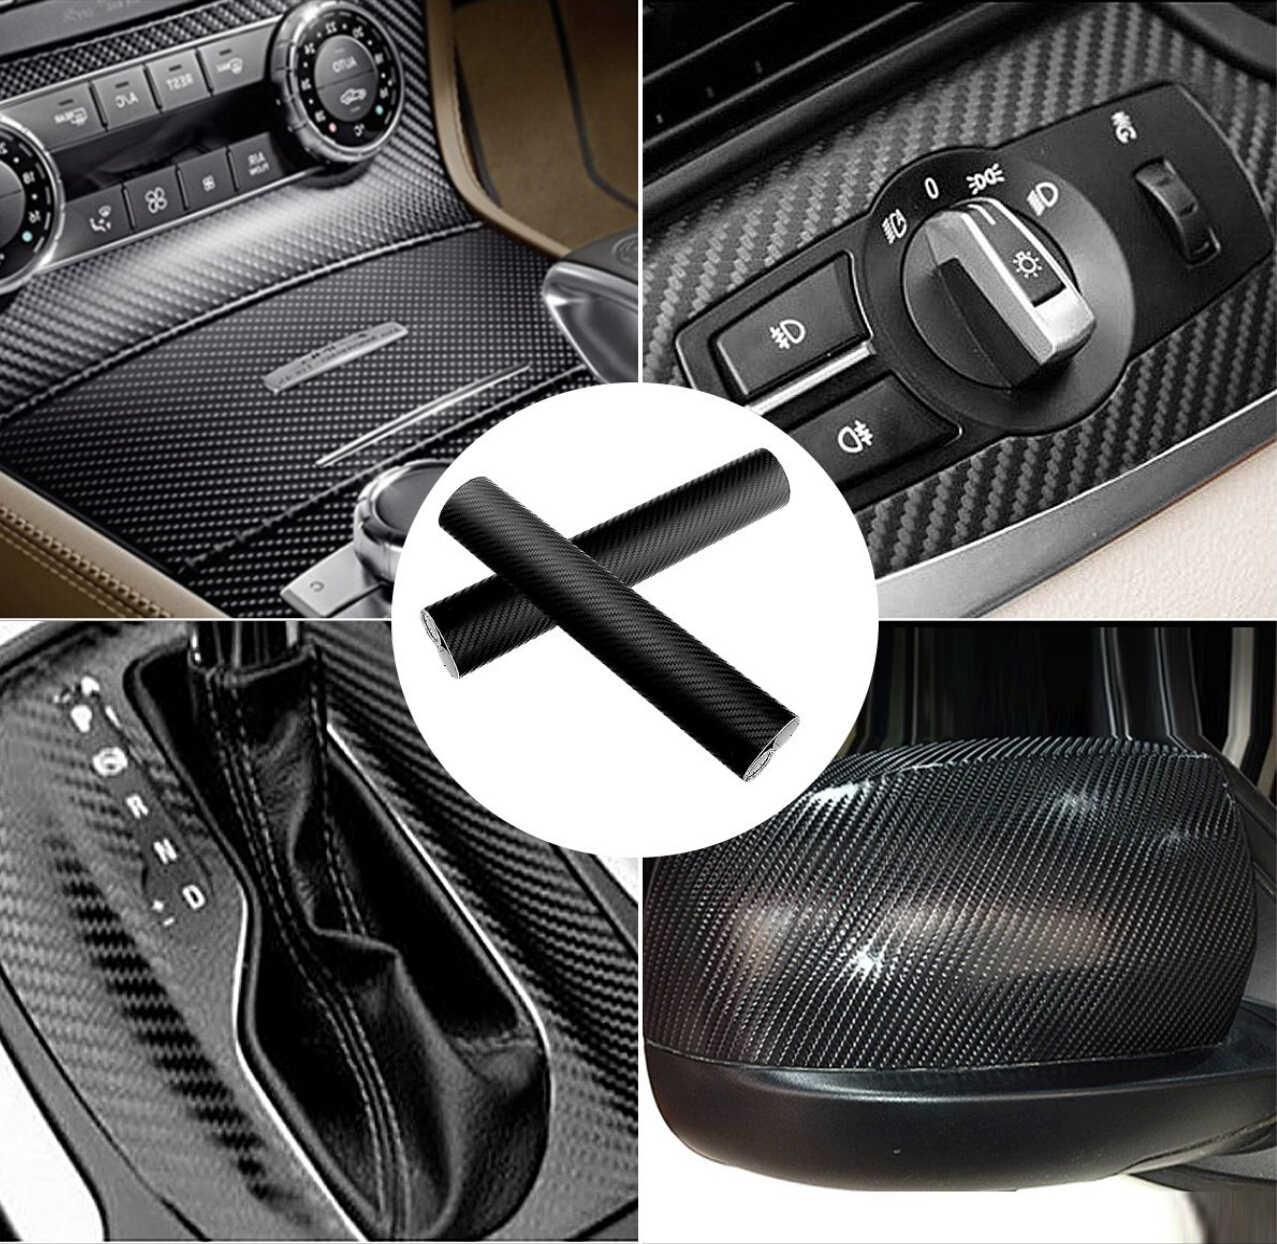 3D Serat Karbon Mobil Stiker Decals 2019 Hot untuk Citroen C4 Toyota Nissan Qashqai Suzuki SX4 Toyota C-Jam renault Fluence